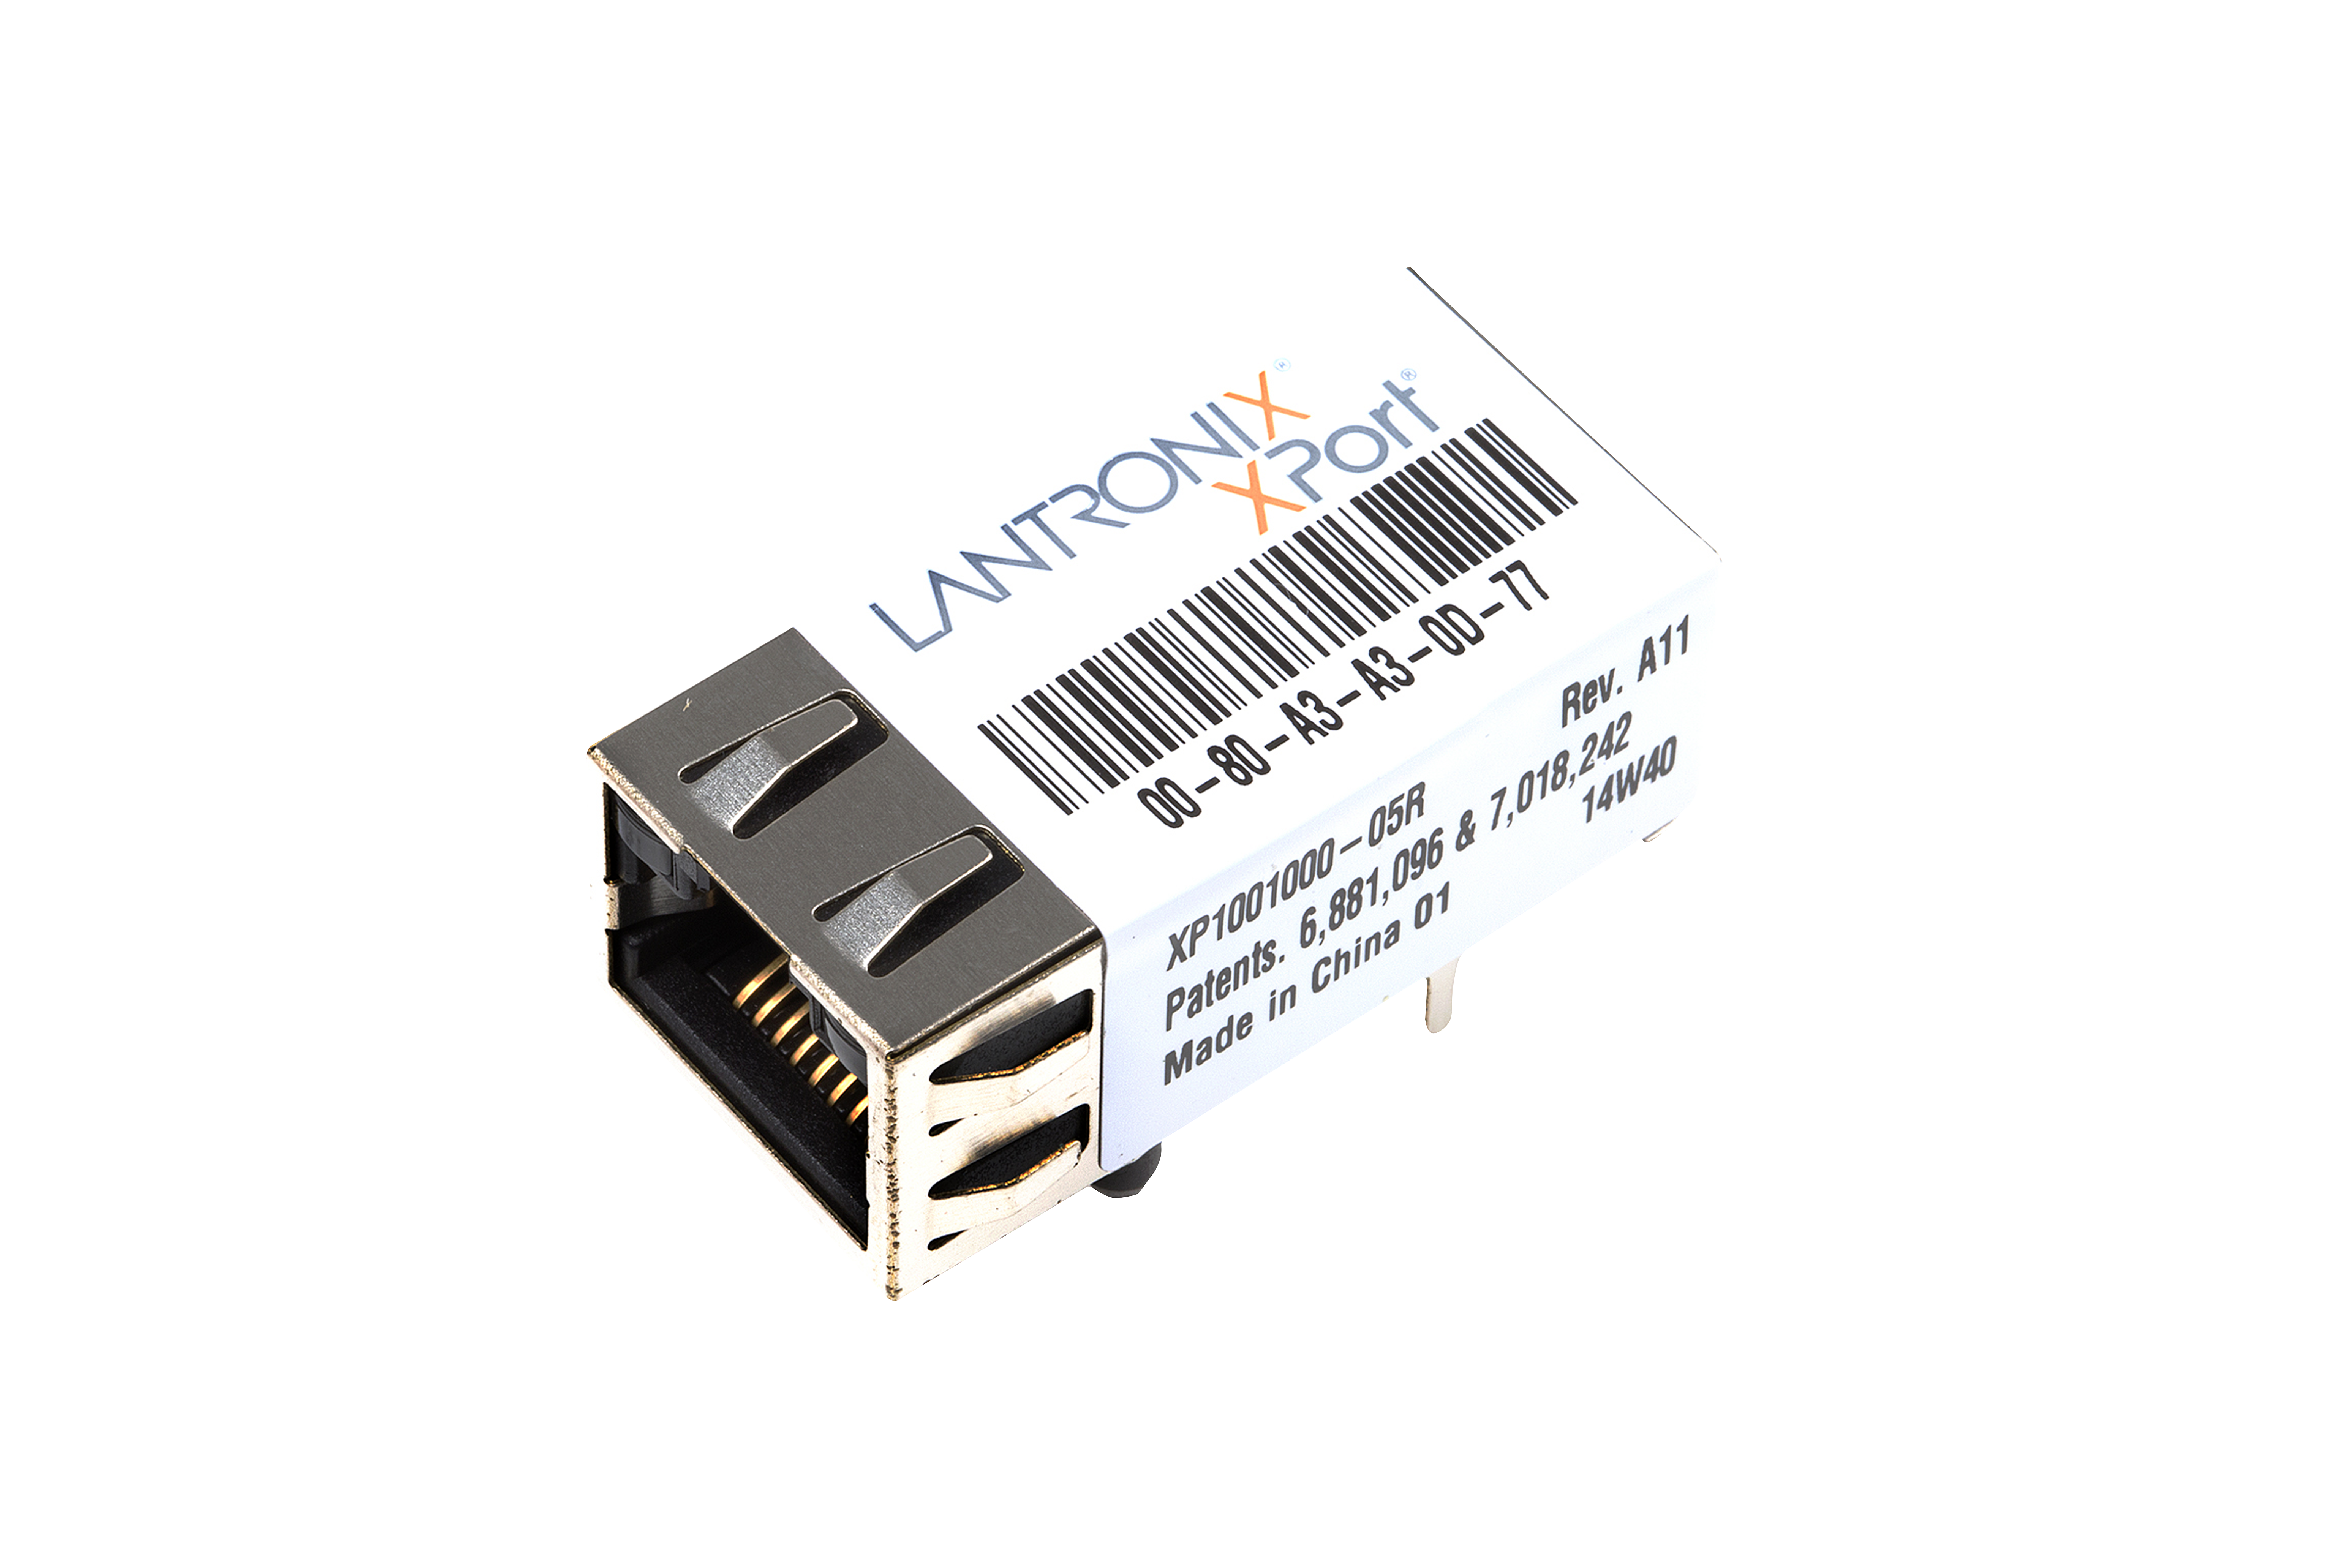 Lantronix Xport Xe Serial To Ethernet Device Server - Xp1001000-05R